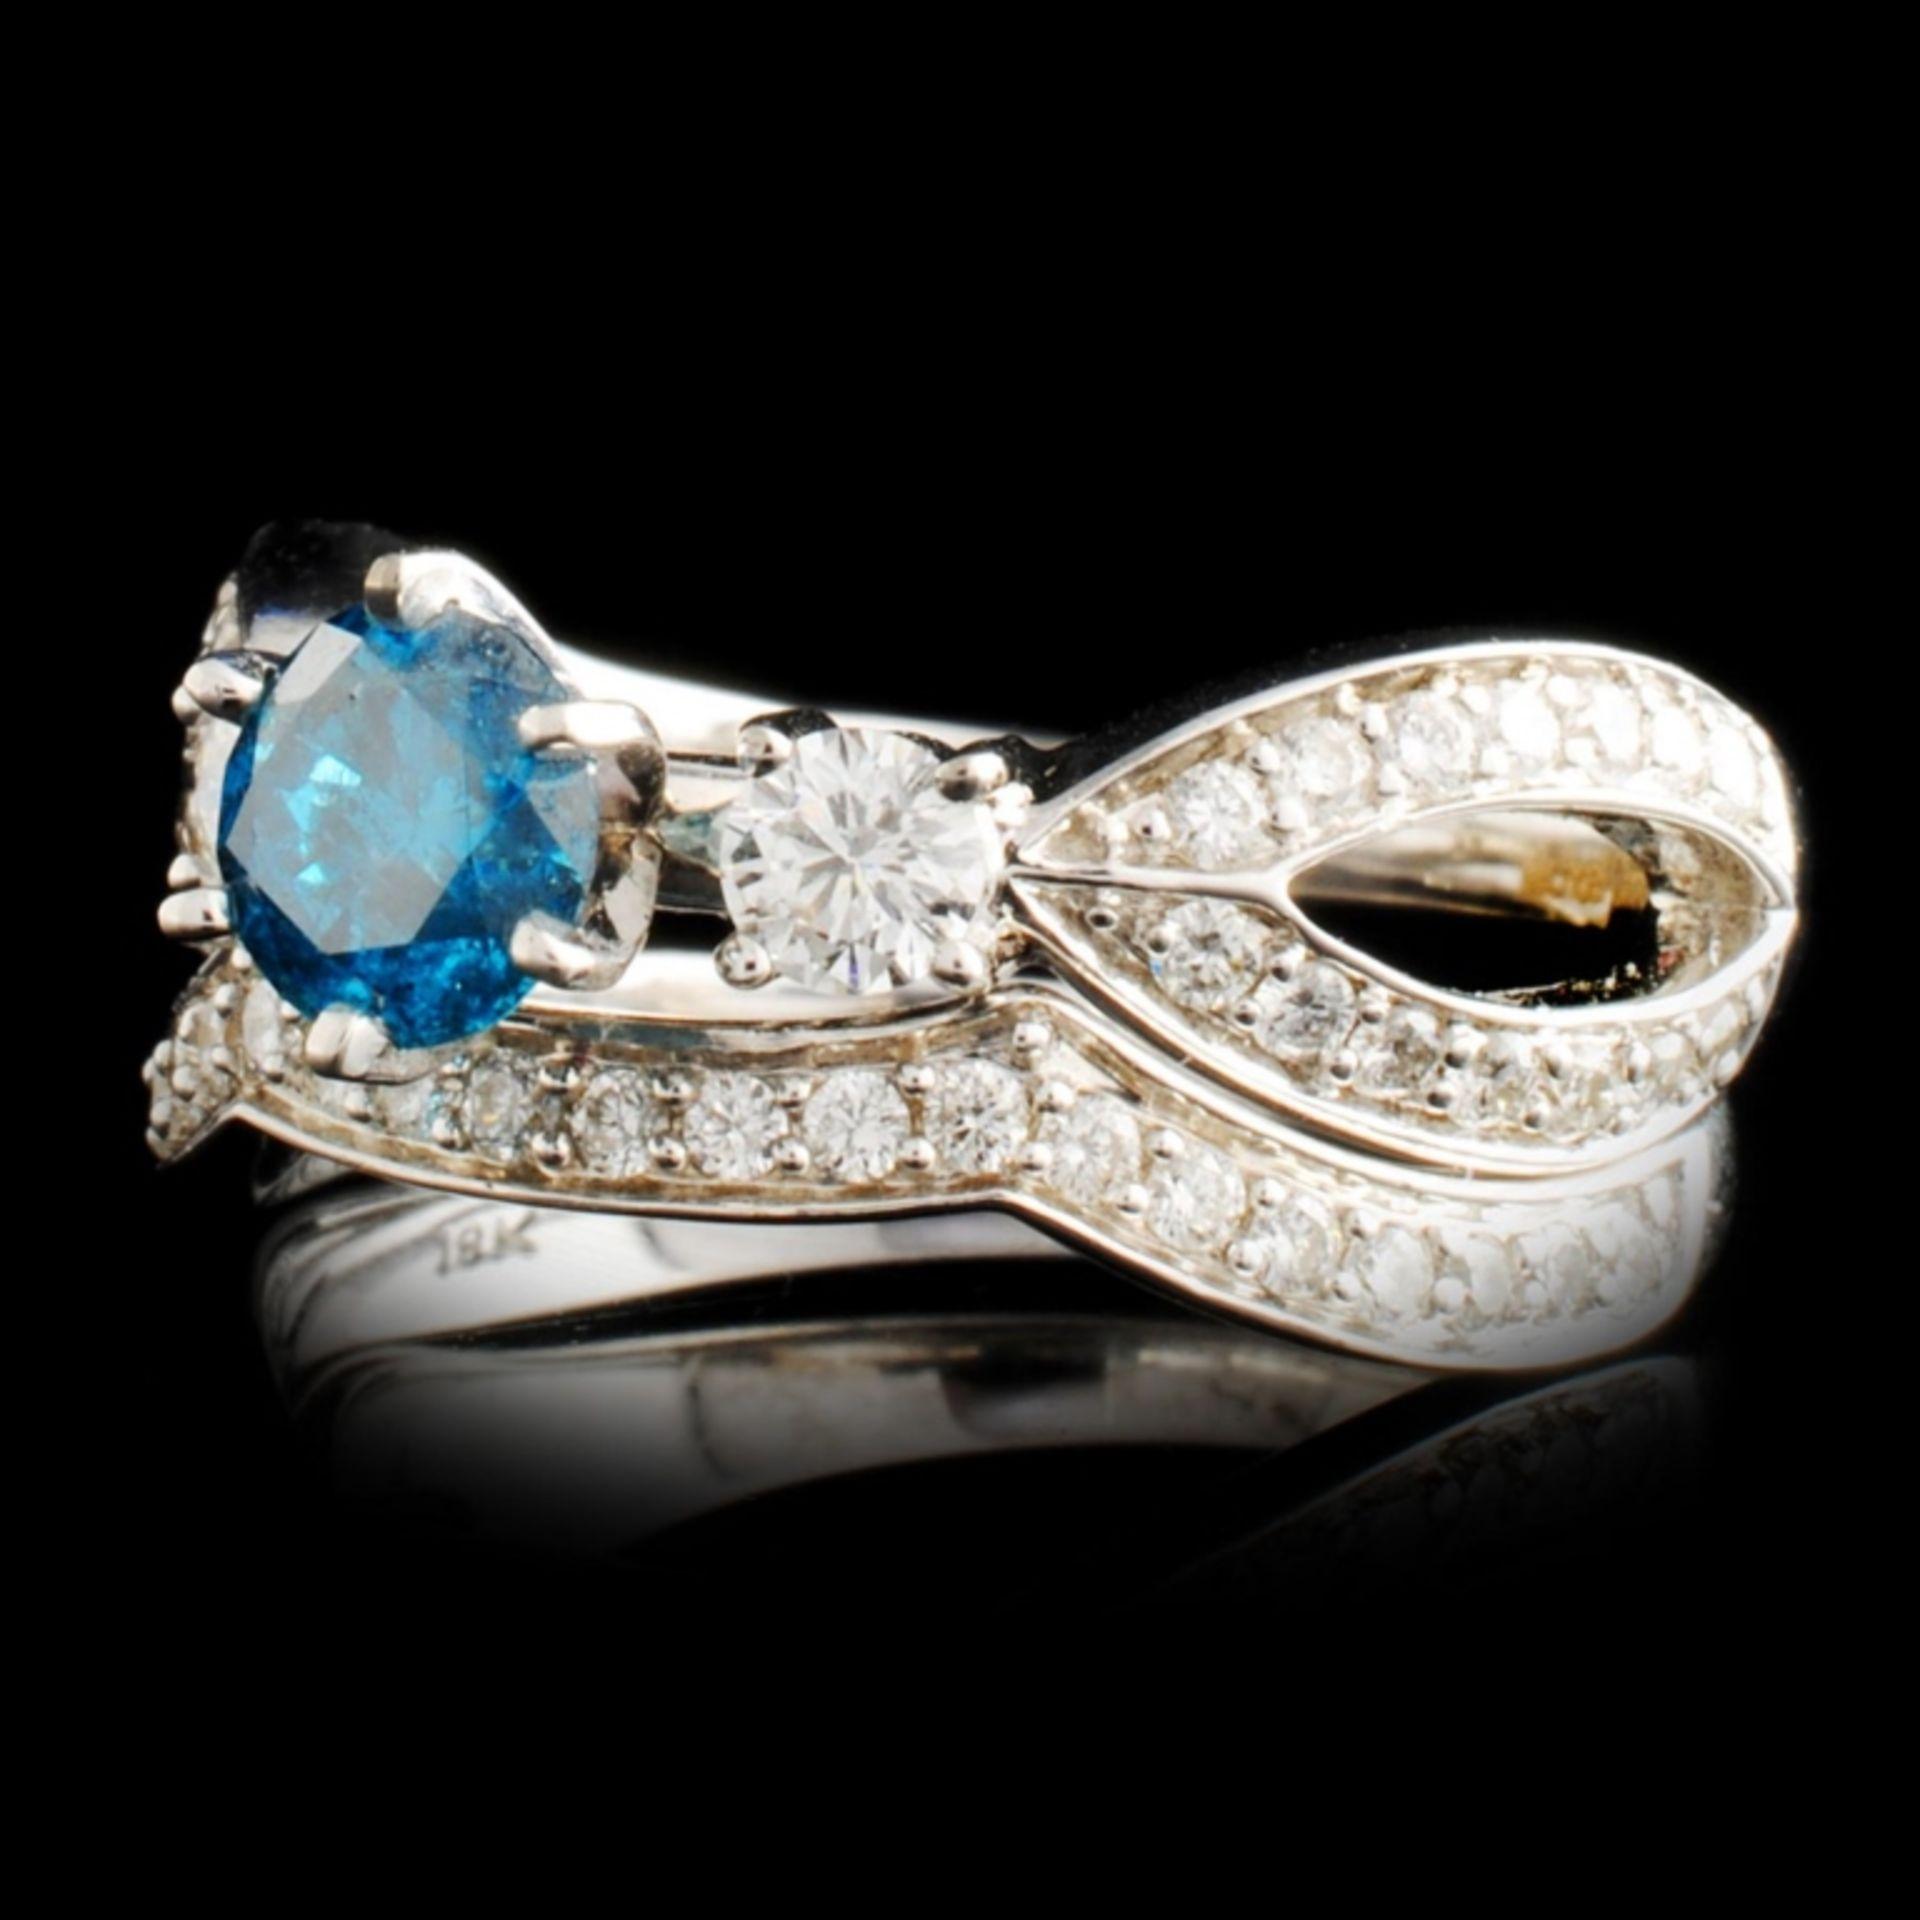 18K Gold 1.35ctw Diamond Ring - Image 2 of 5